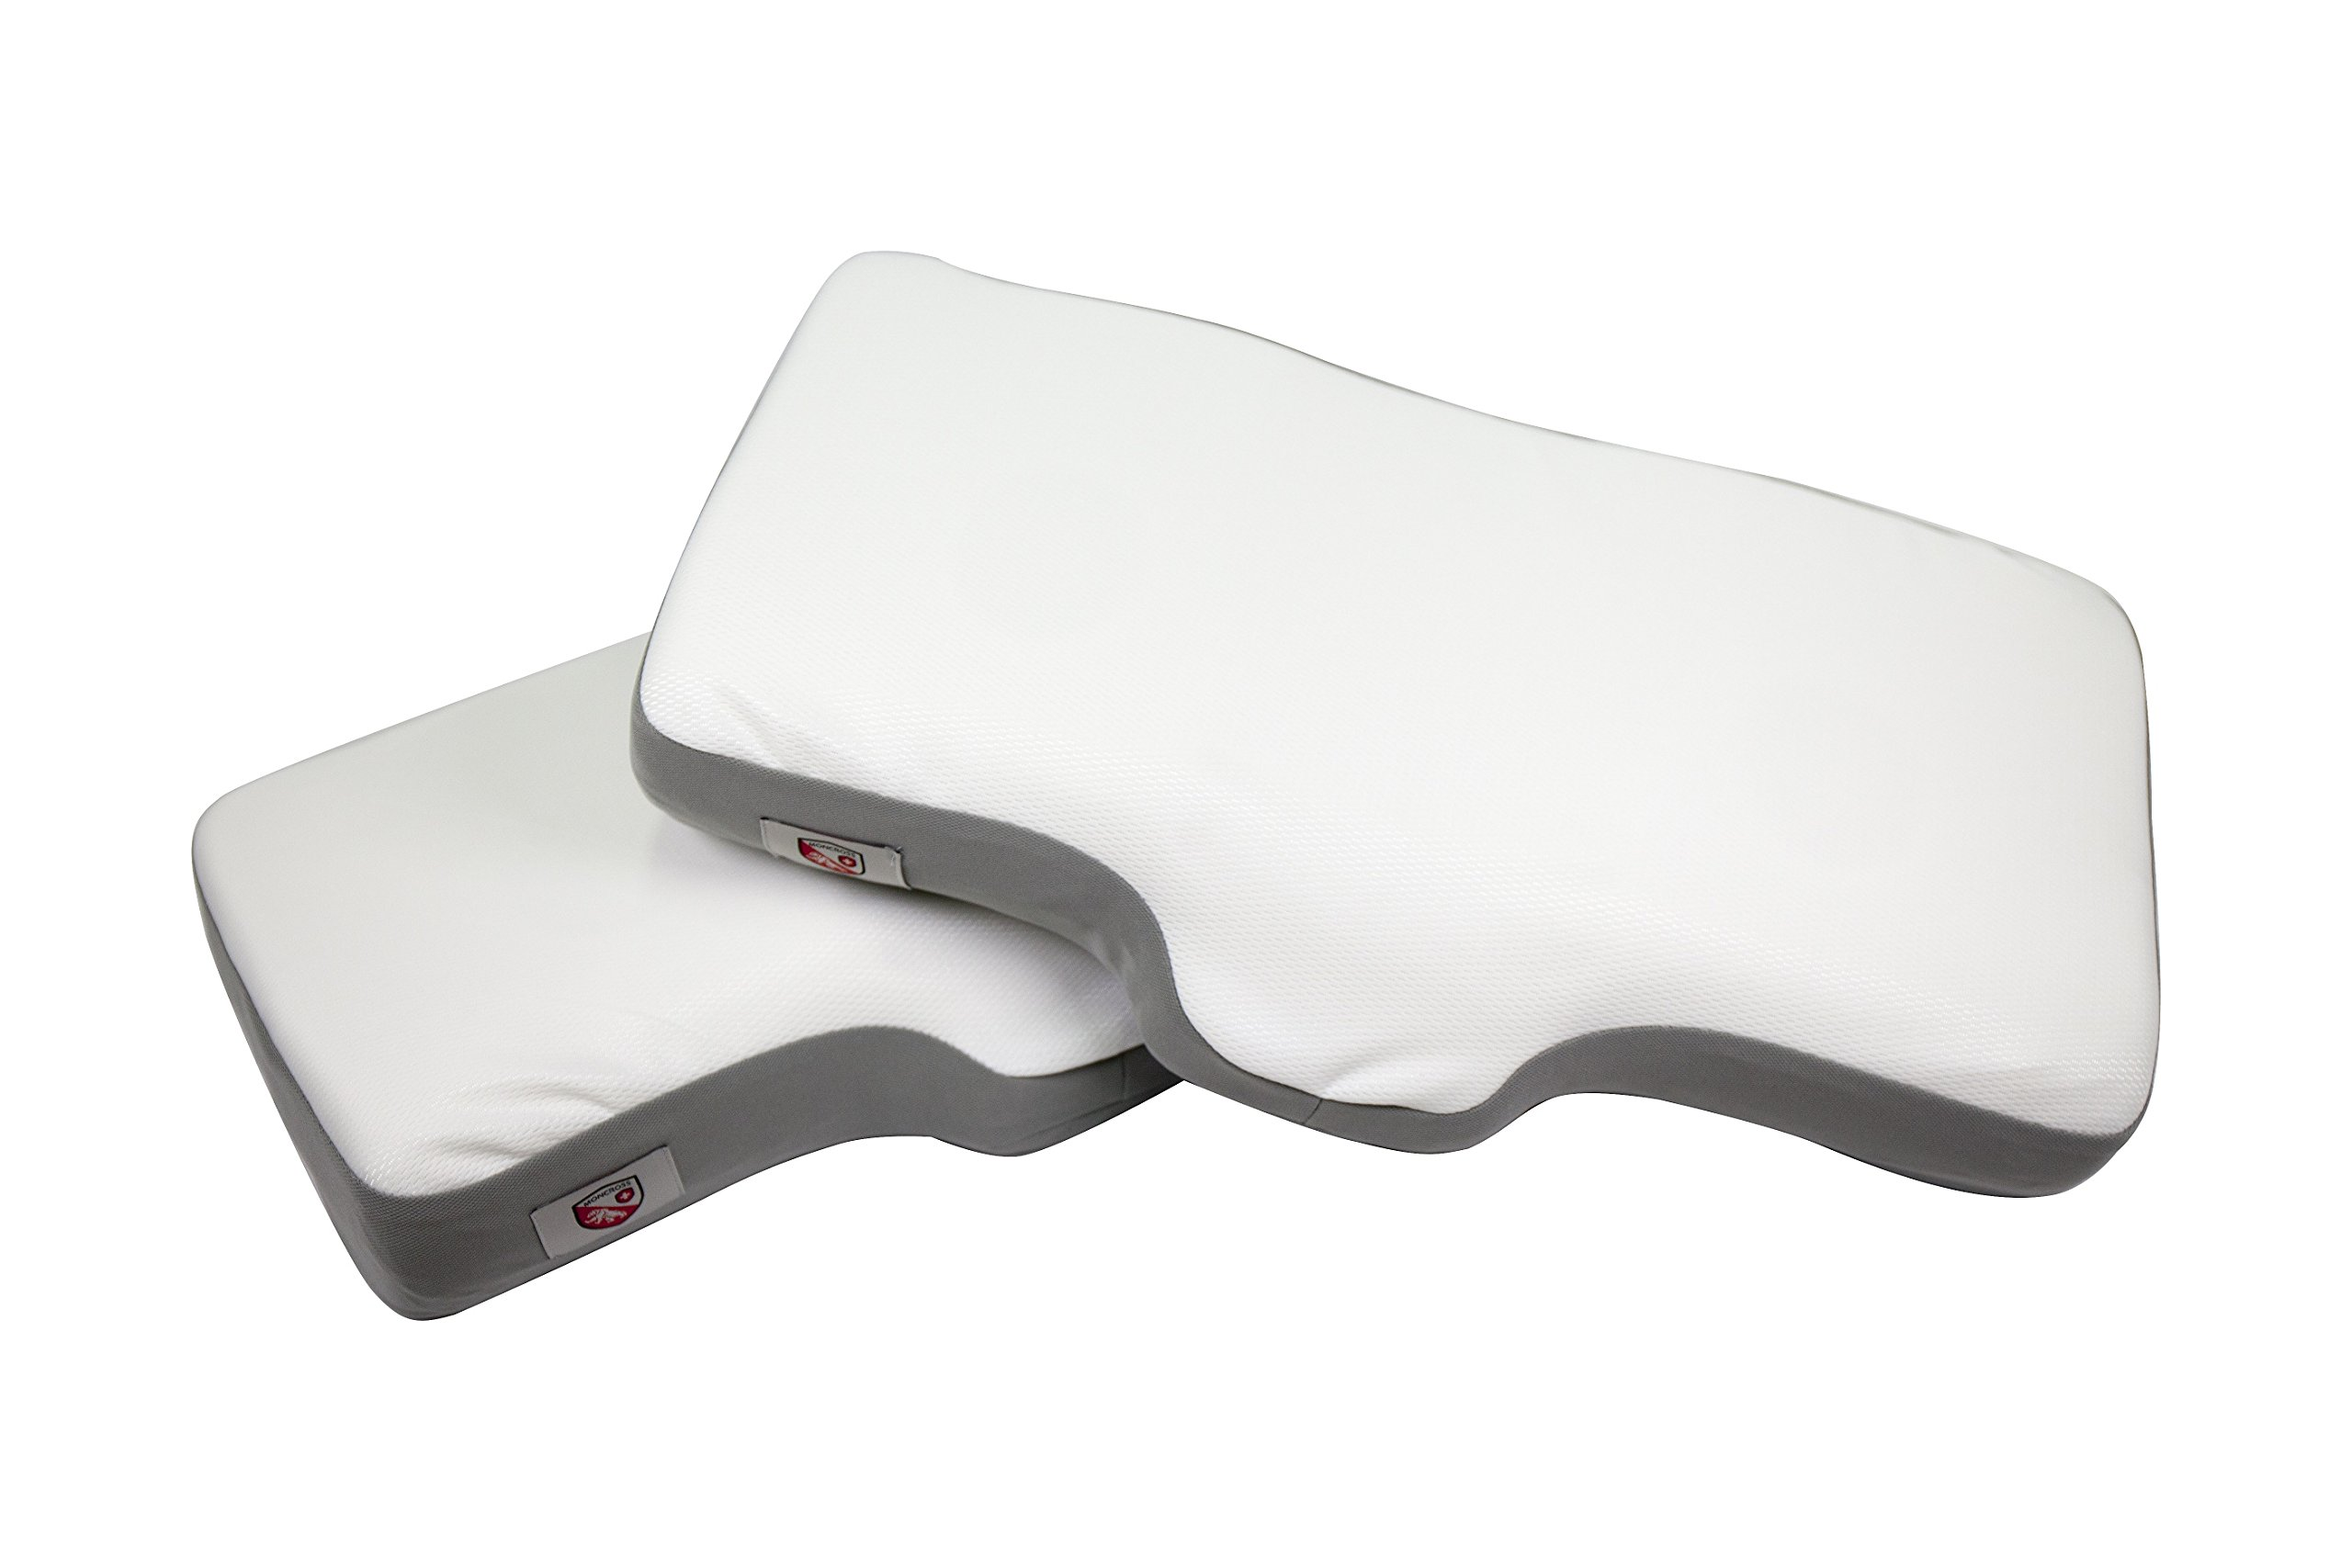 Moncross Functional Memory Foam Pillow Set (2-Pack)